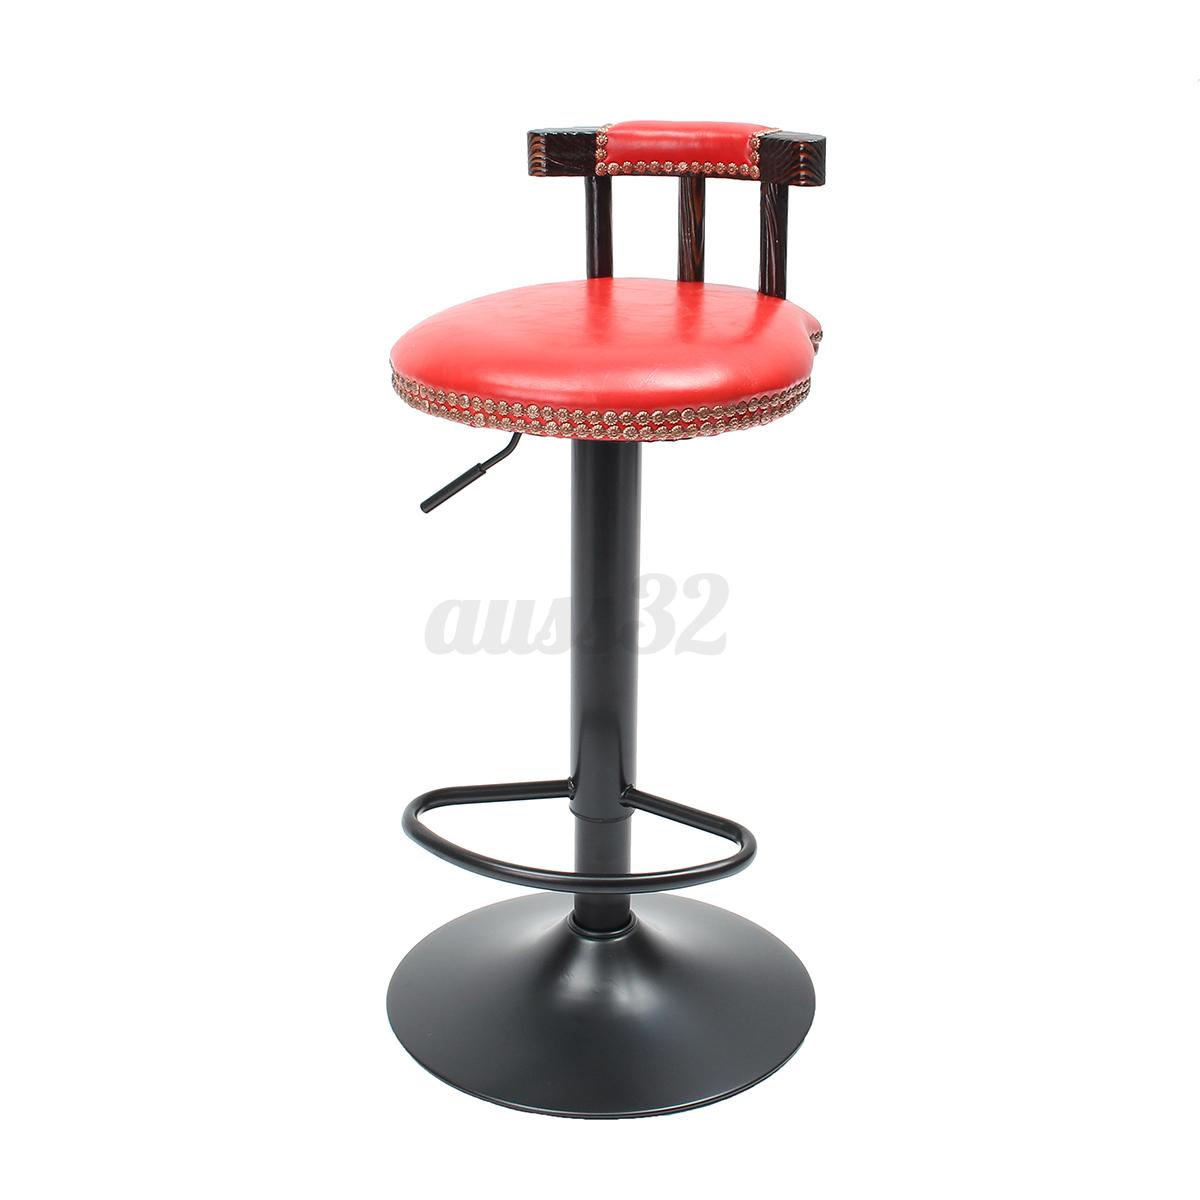 Adjustable-Retro-Metal-Craft-Bar-Stool-Furniture-Swivel-Cafe-Counter-Chair-250LB